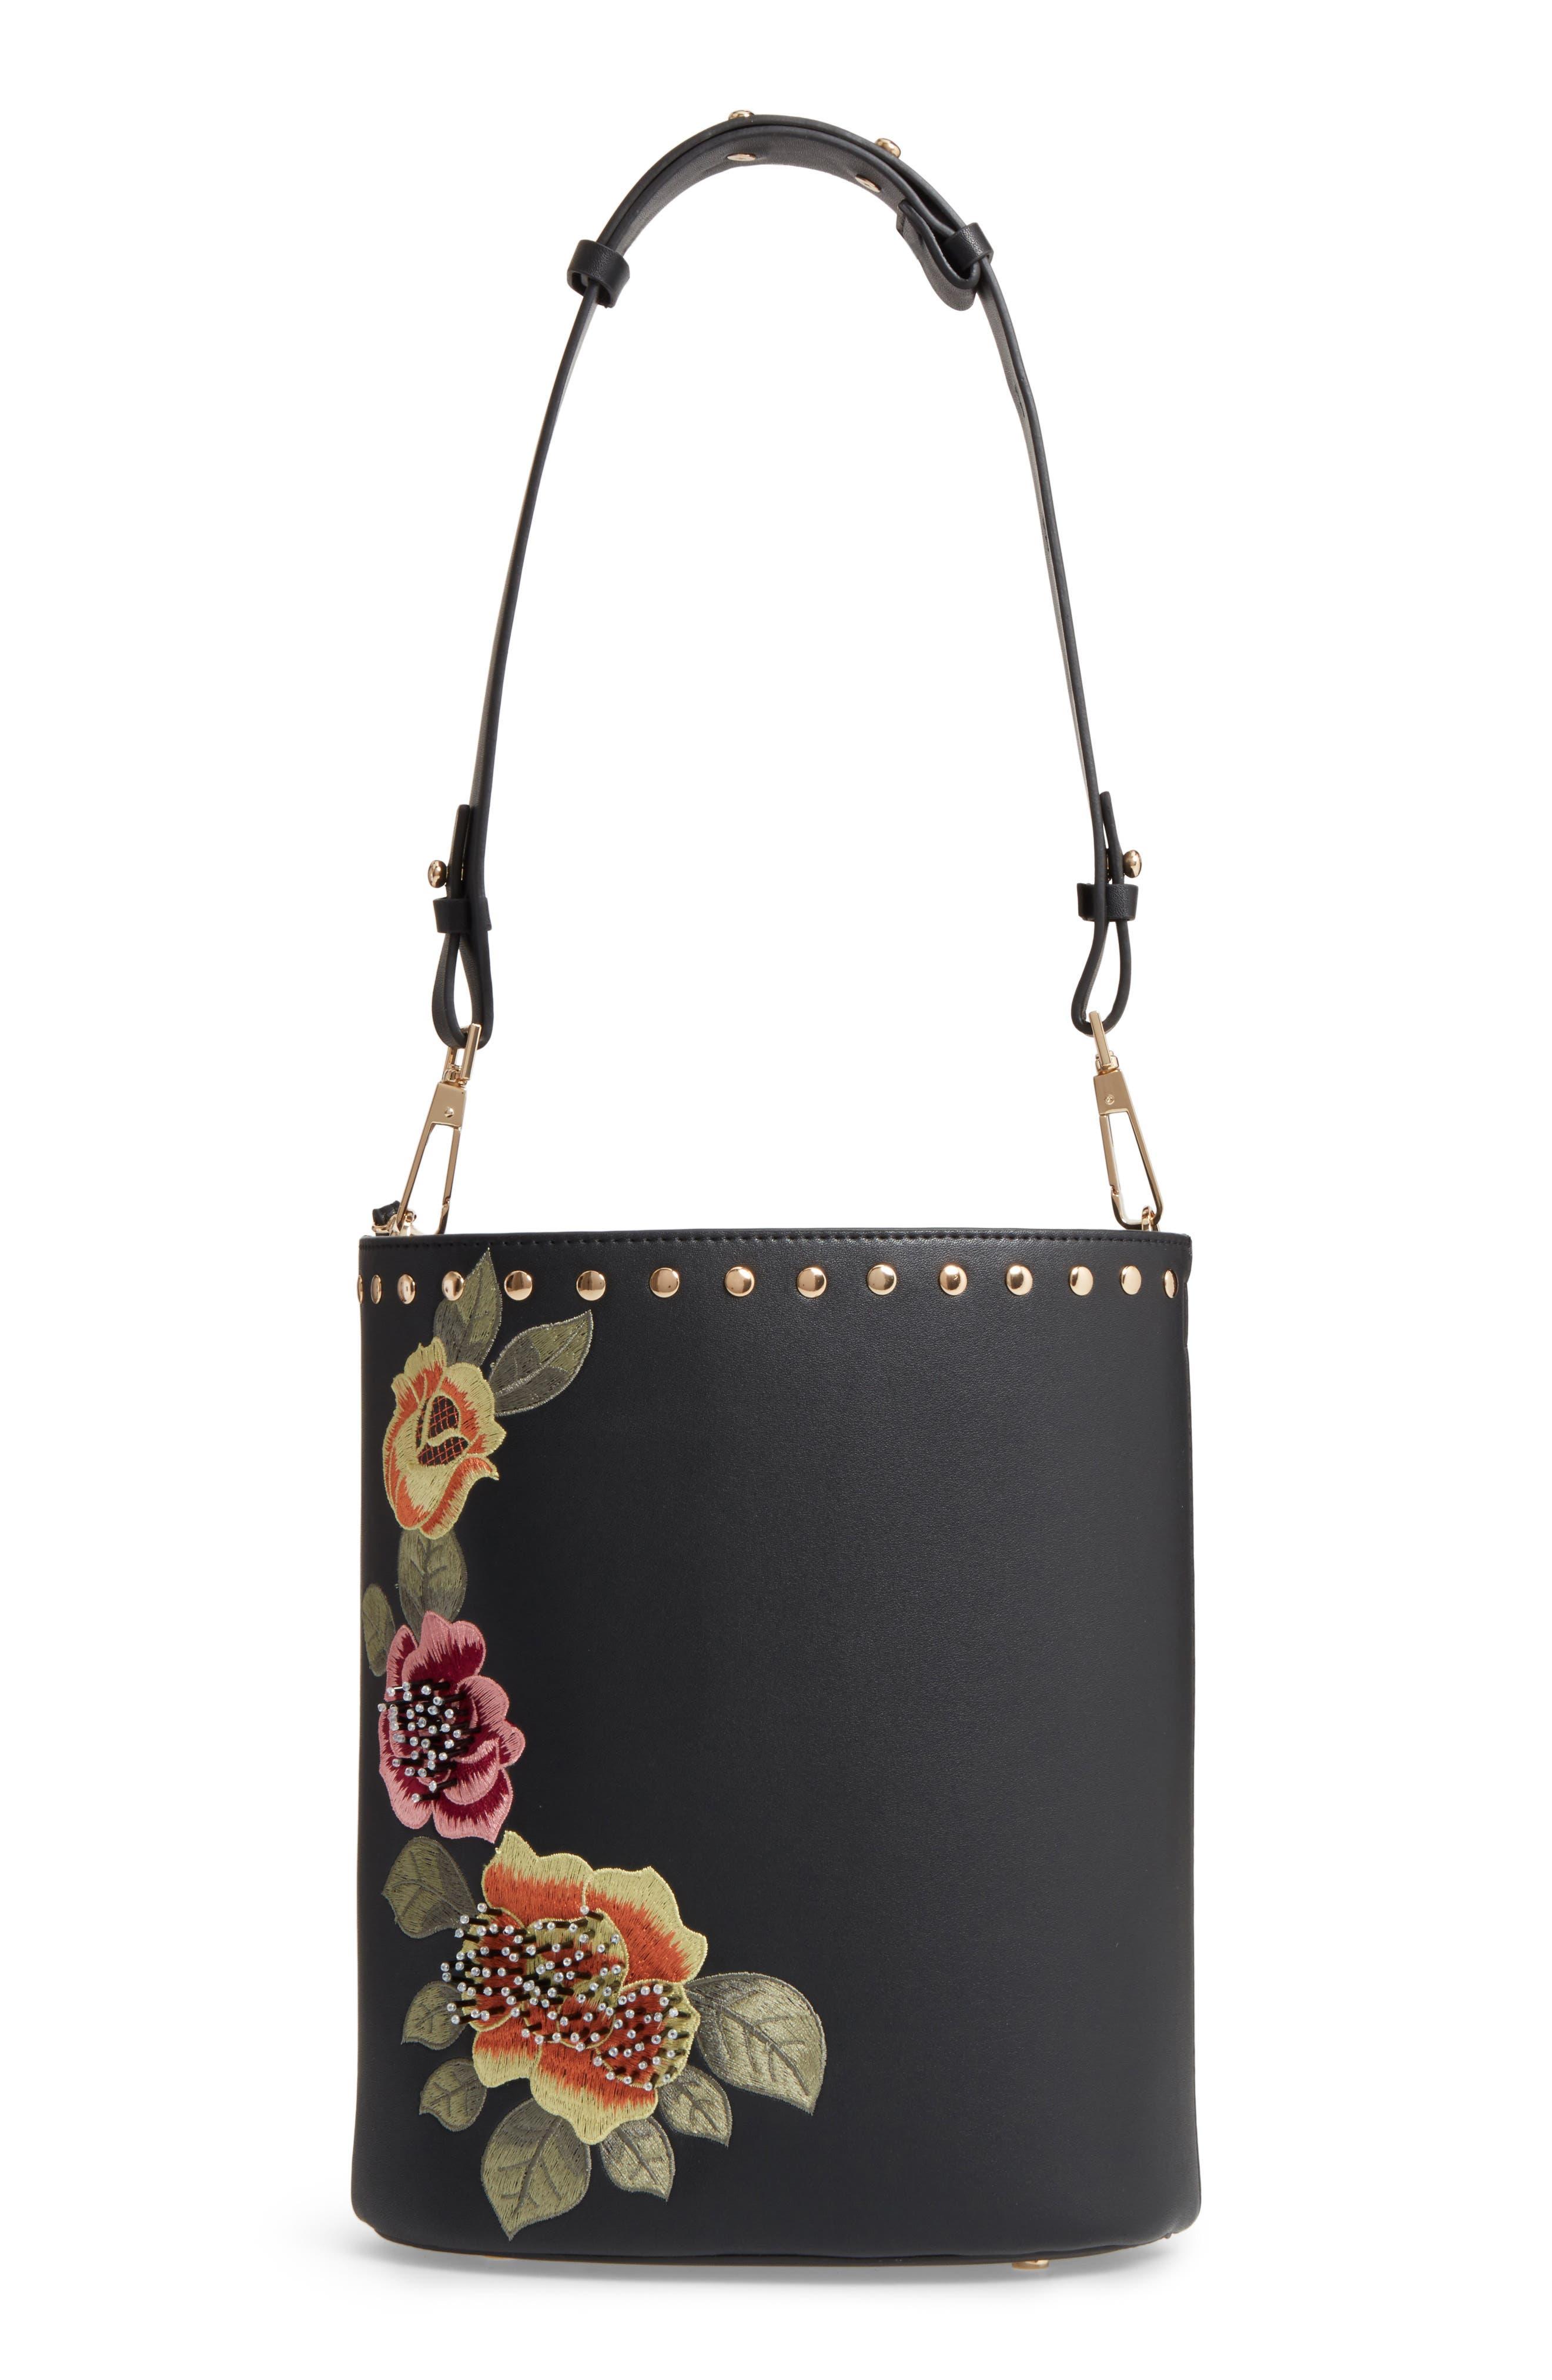 Alternate Image 1 Selected - Topshop Sadie Floral Faux Leather Bucket Bag